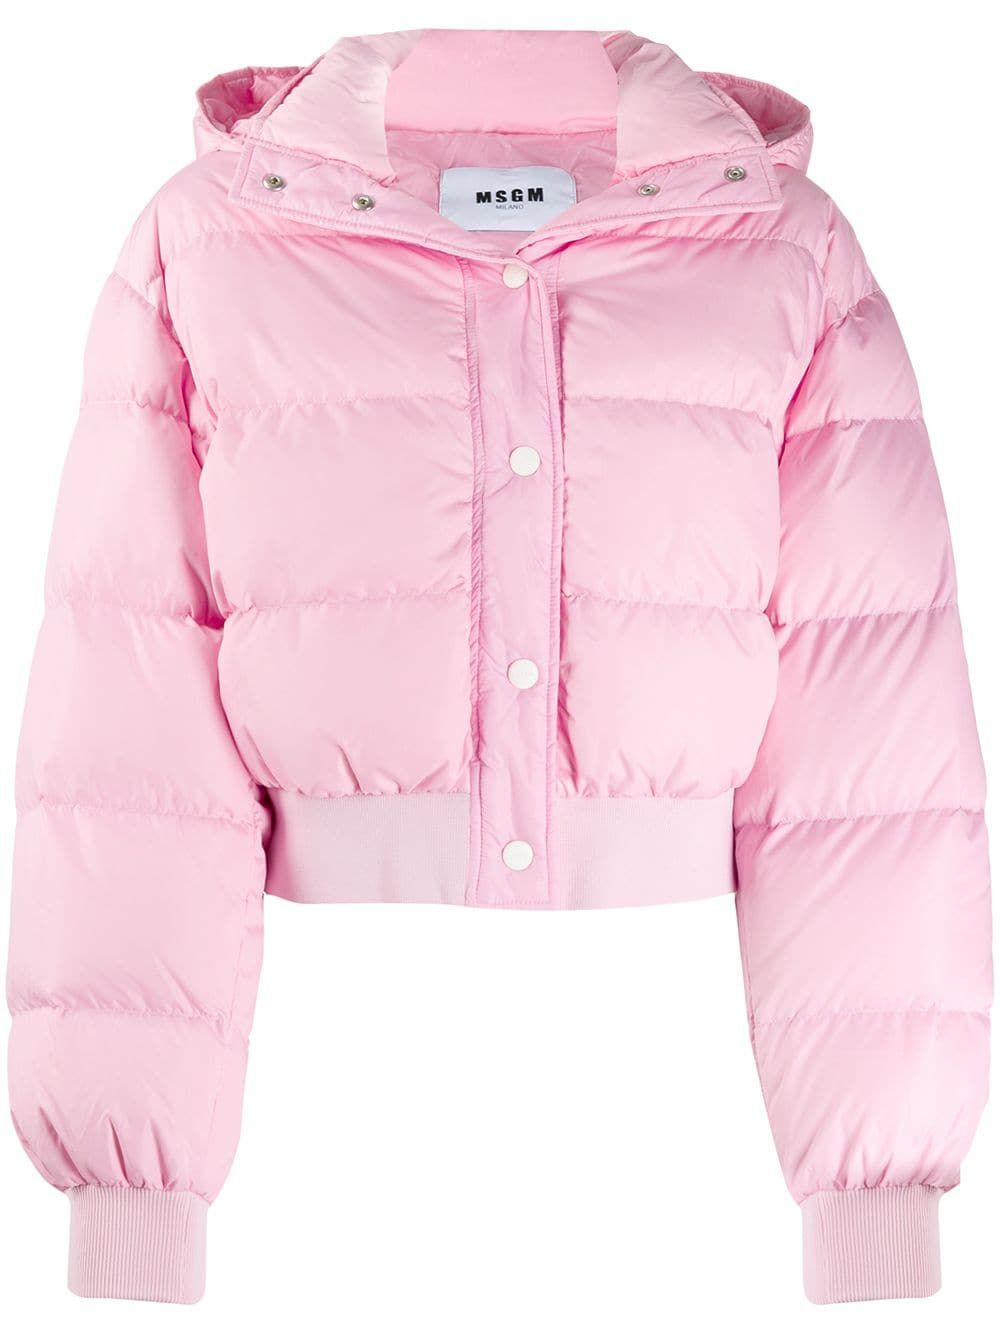 Msgm Cropped Puffer Jacket Farfetch Cropped Puffer Jacket Pink Puffer Jacket Fashion Outfits [ 1334 x 1000 Pixel ]